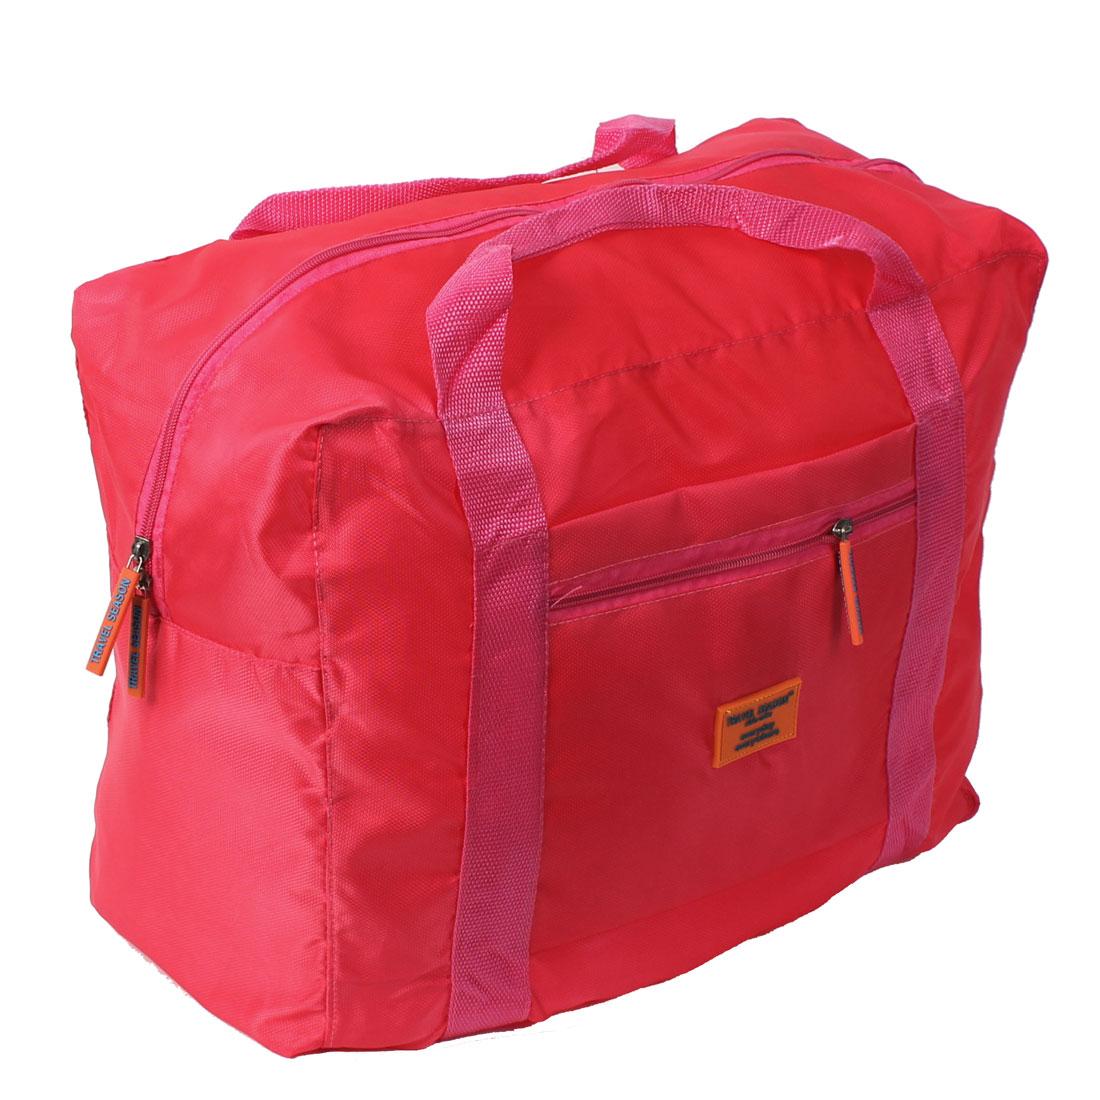 Unique Bargains Nylon Foldable Portable Travel Luggage Clothes Storage Bag Fuchsia